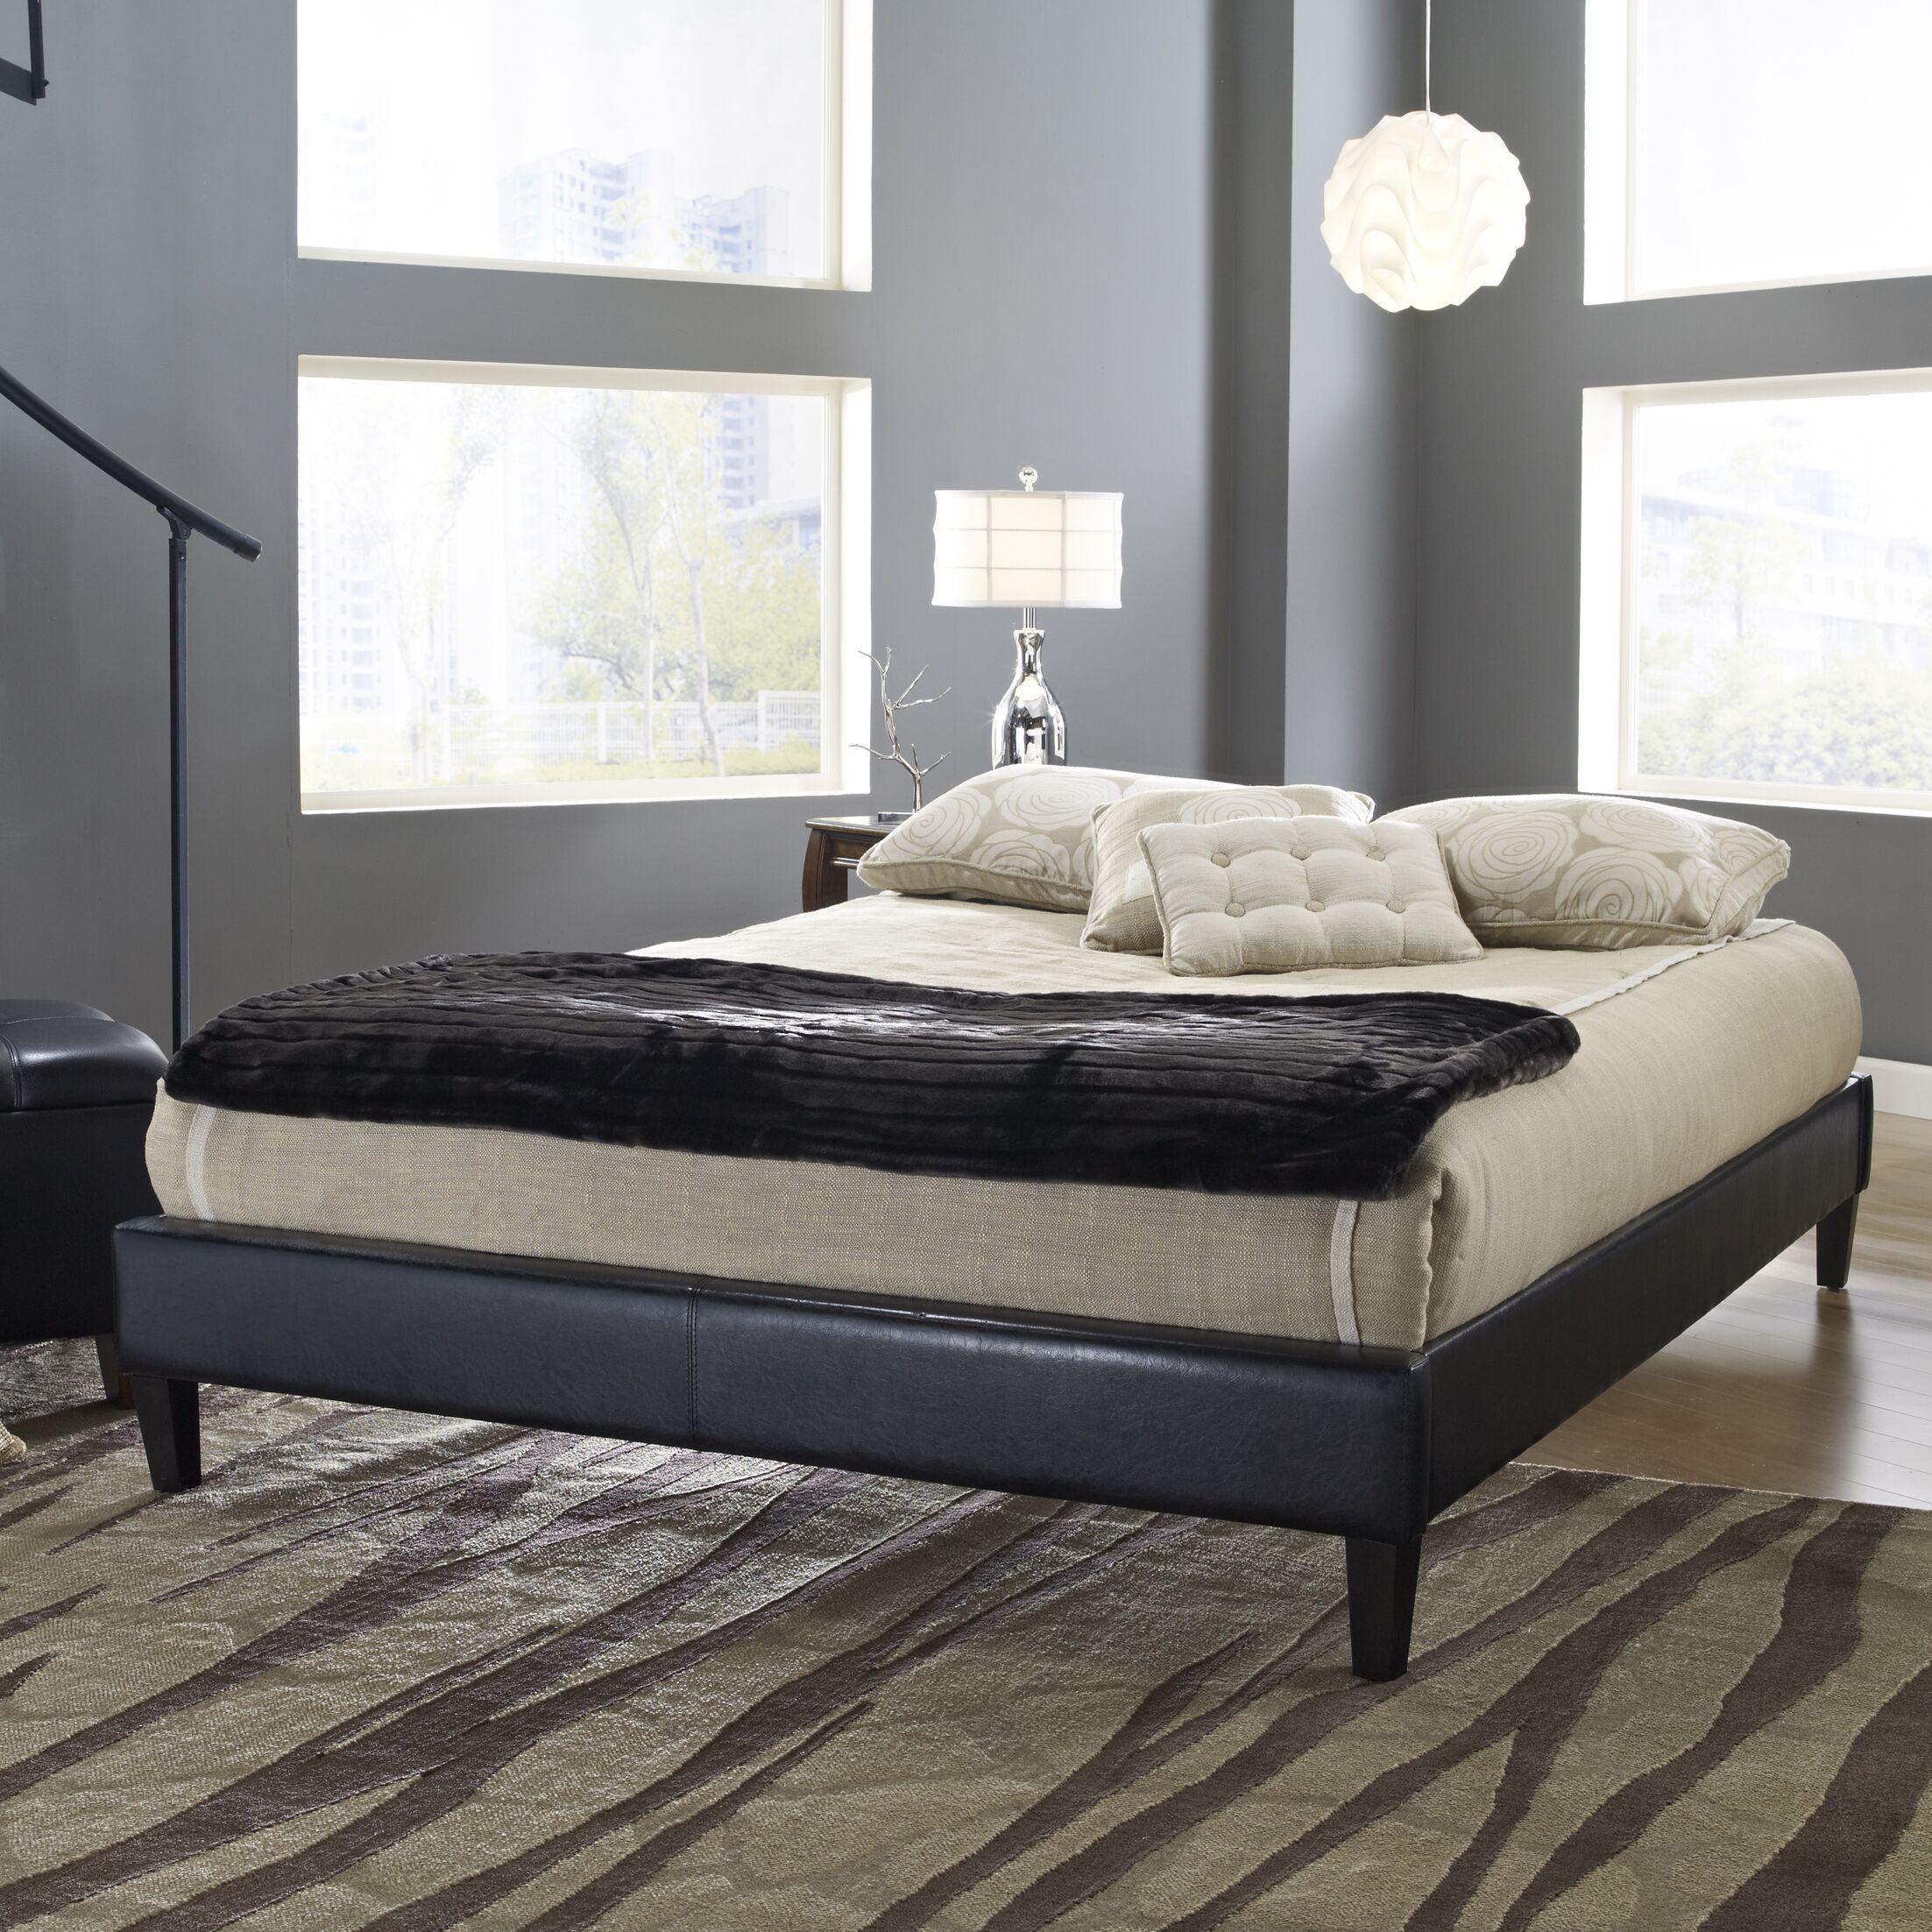 Upholstered Platform Bed Color: White, Size: Twin